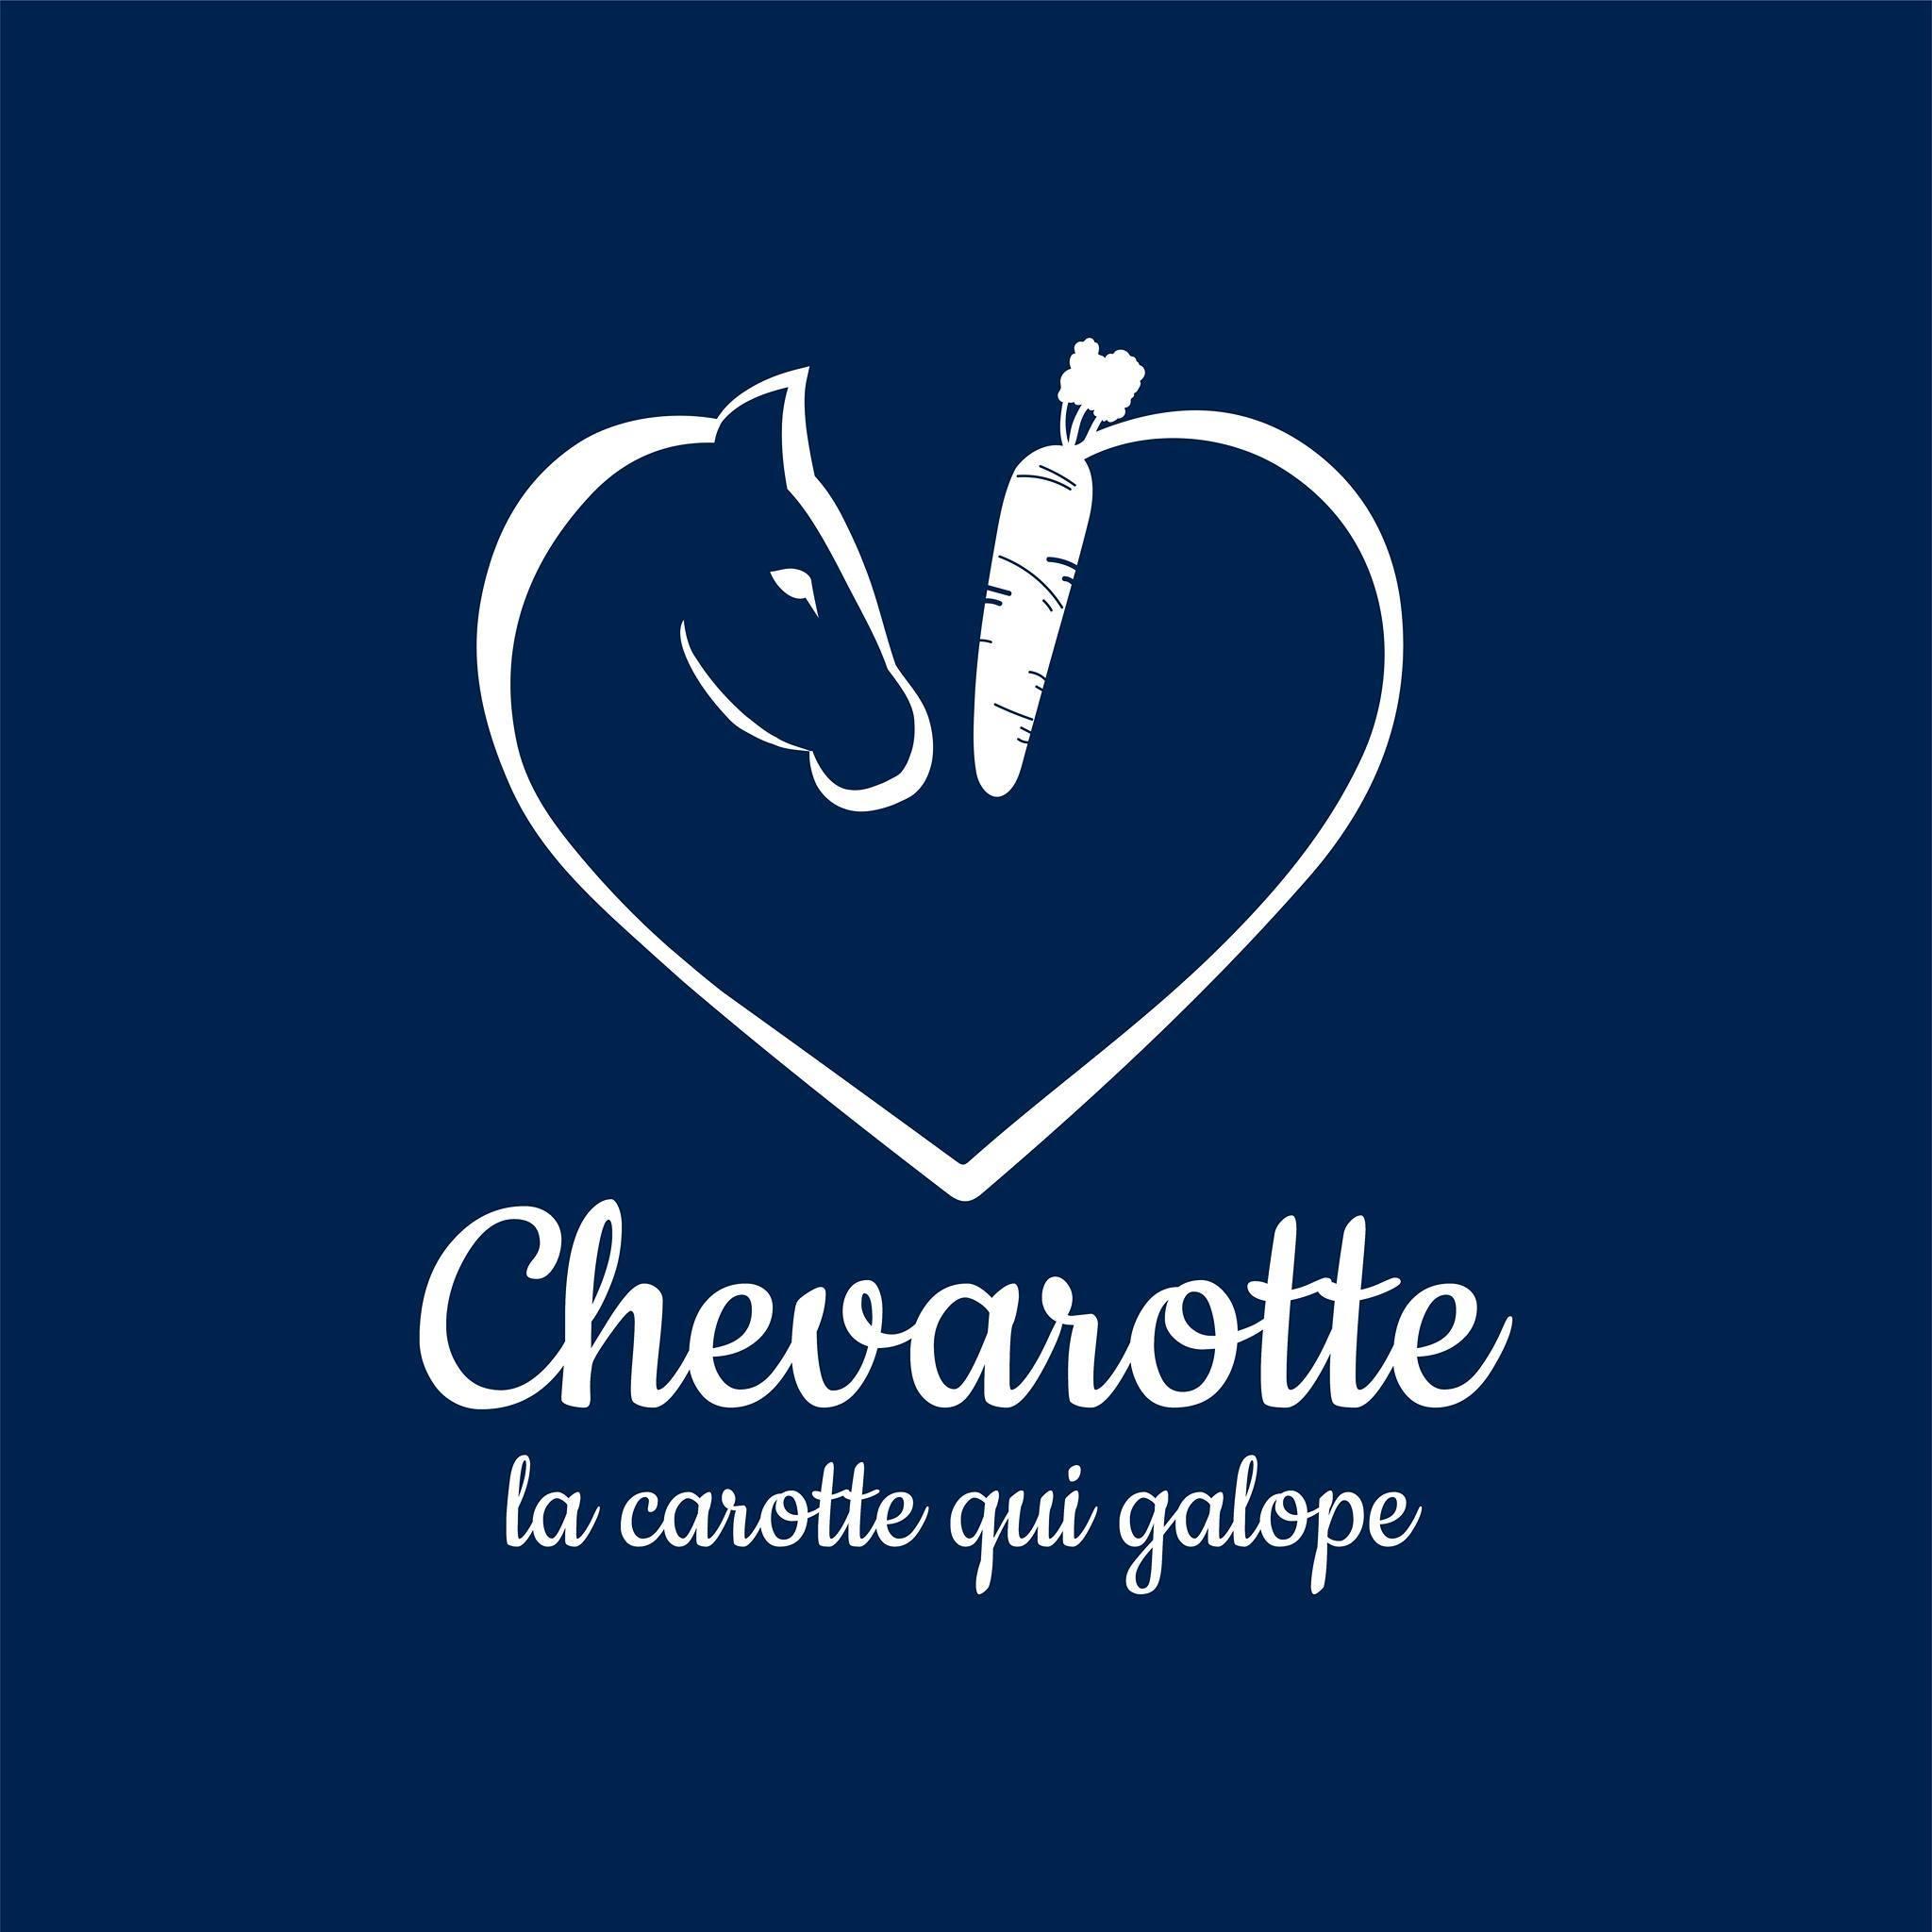 Chevarotte